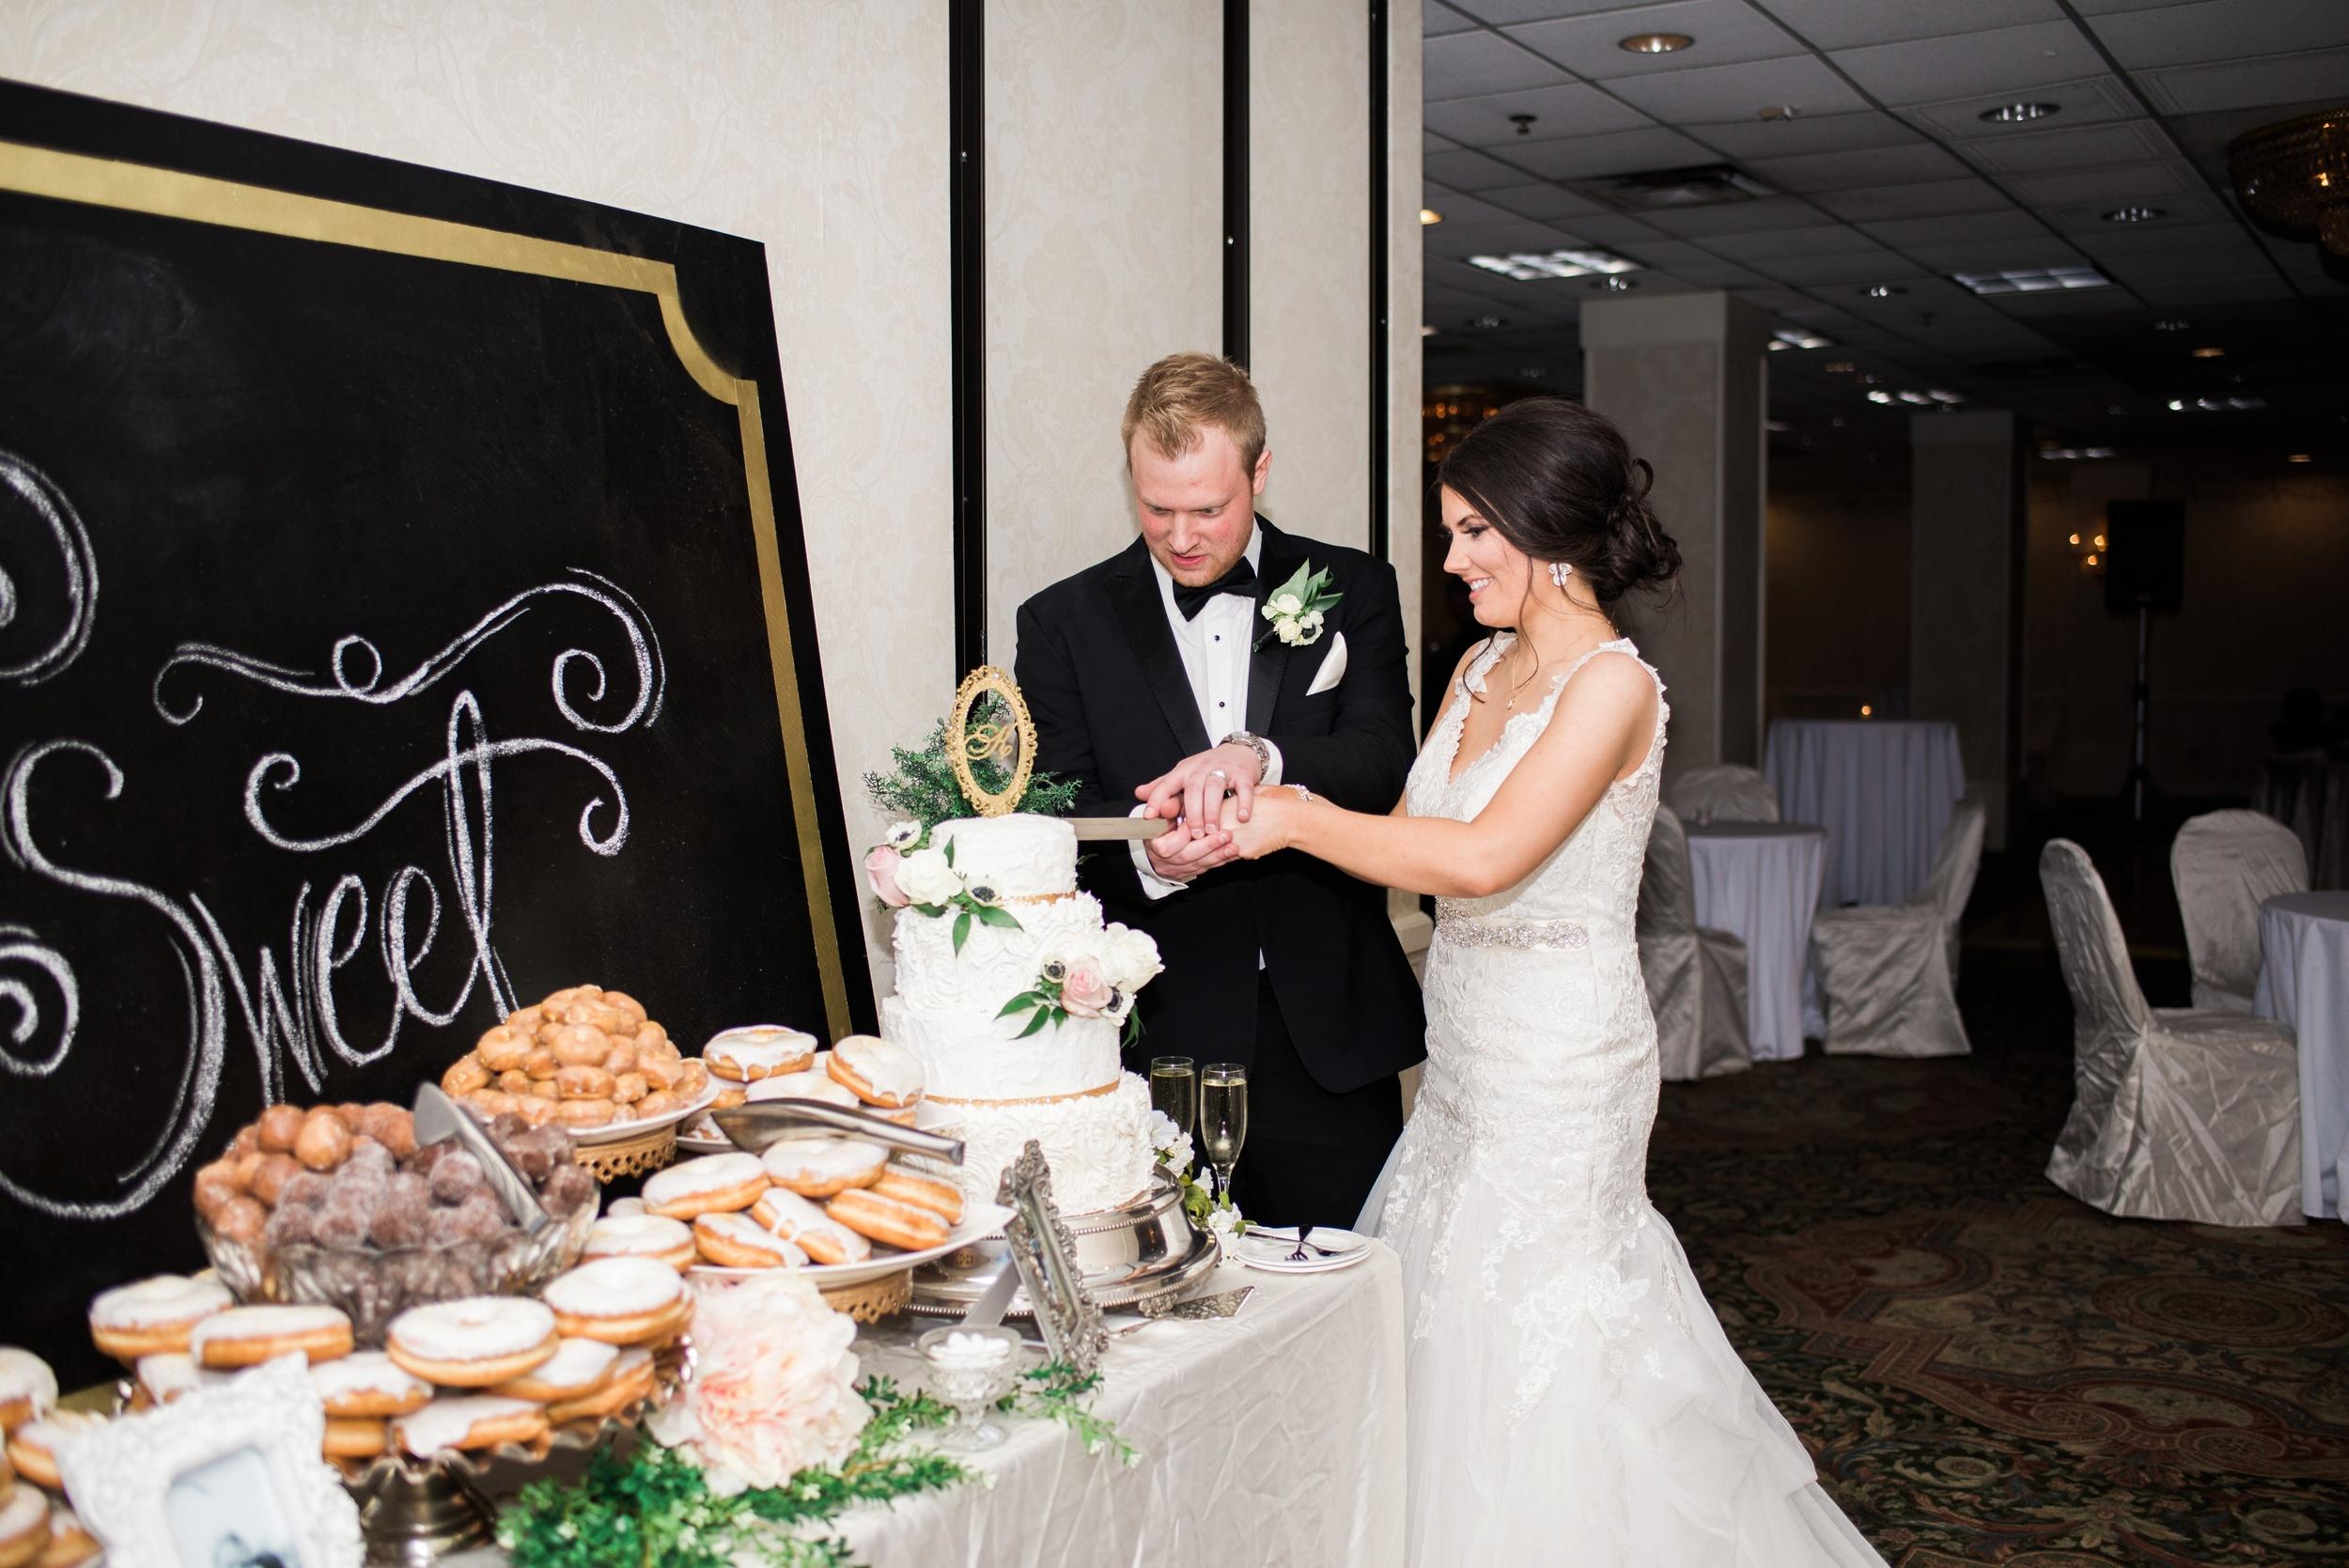 Downtown Des Moines Wedding Photographer_2130.jpg